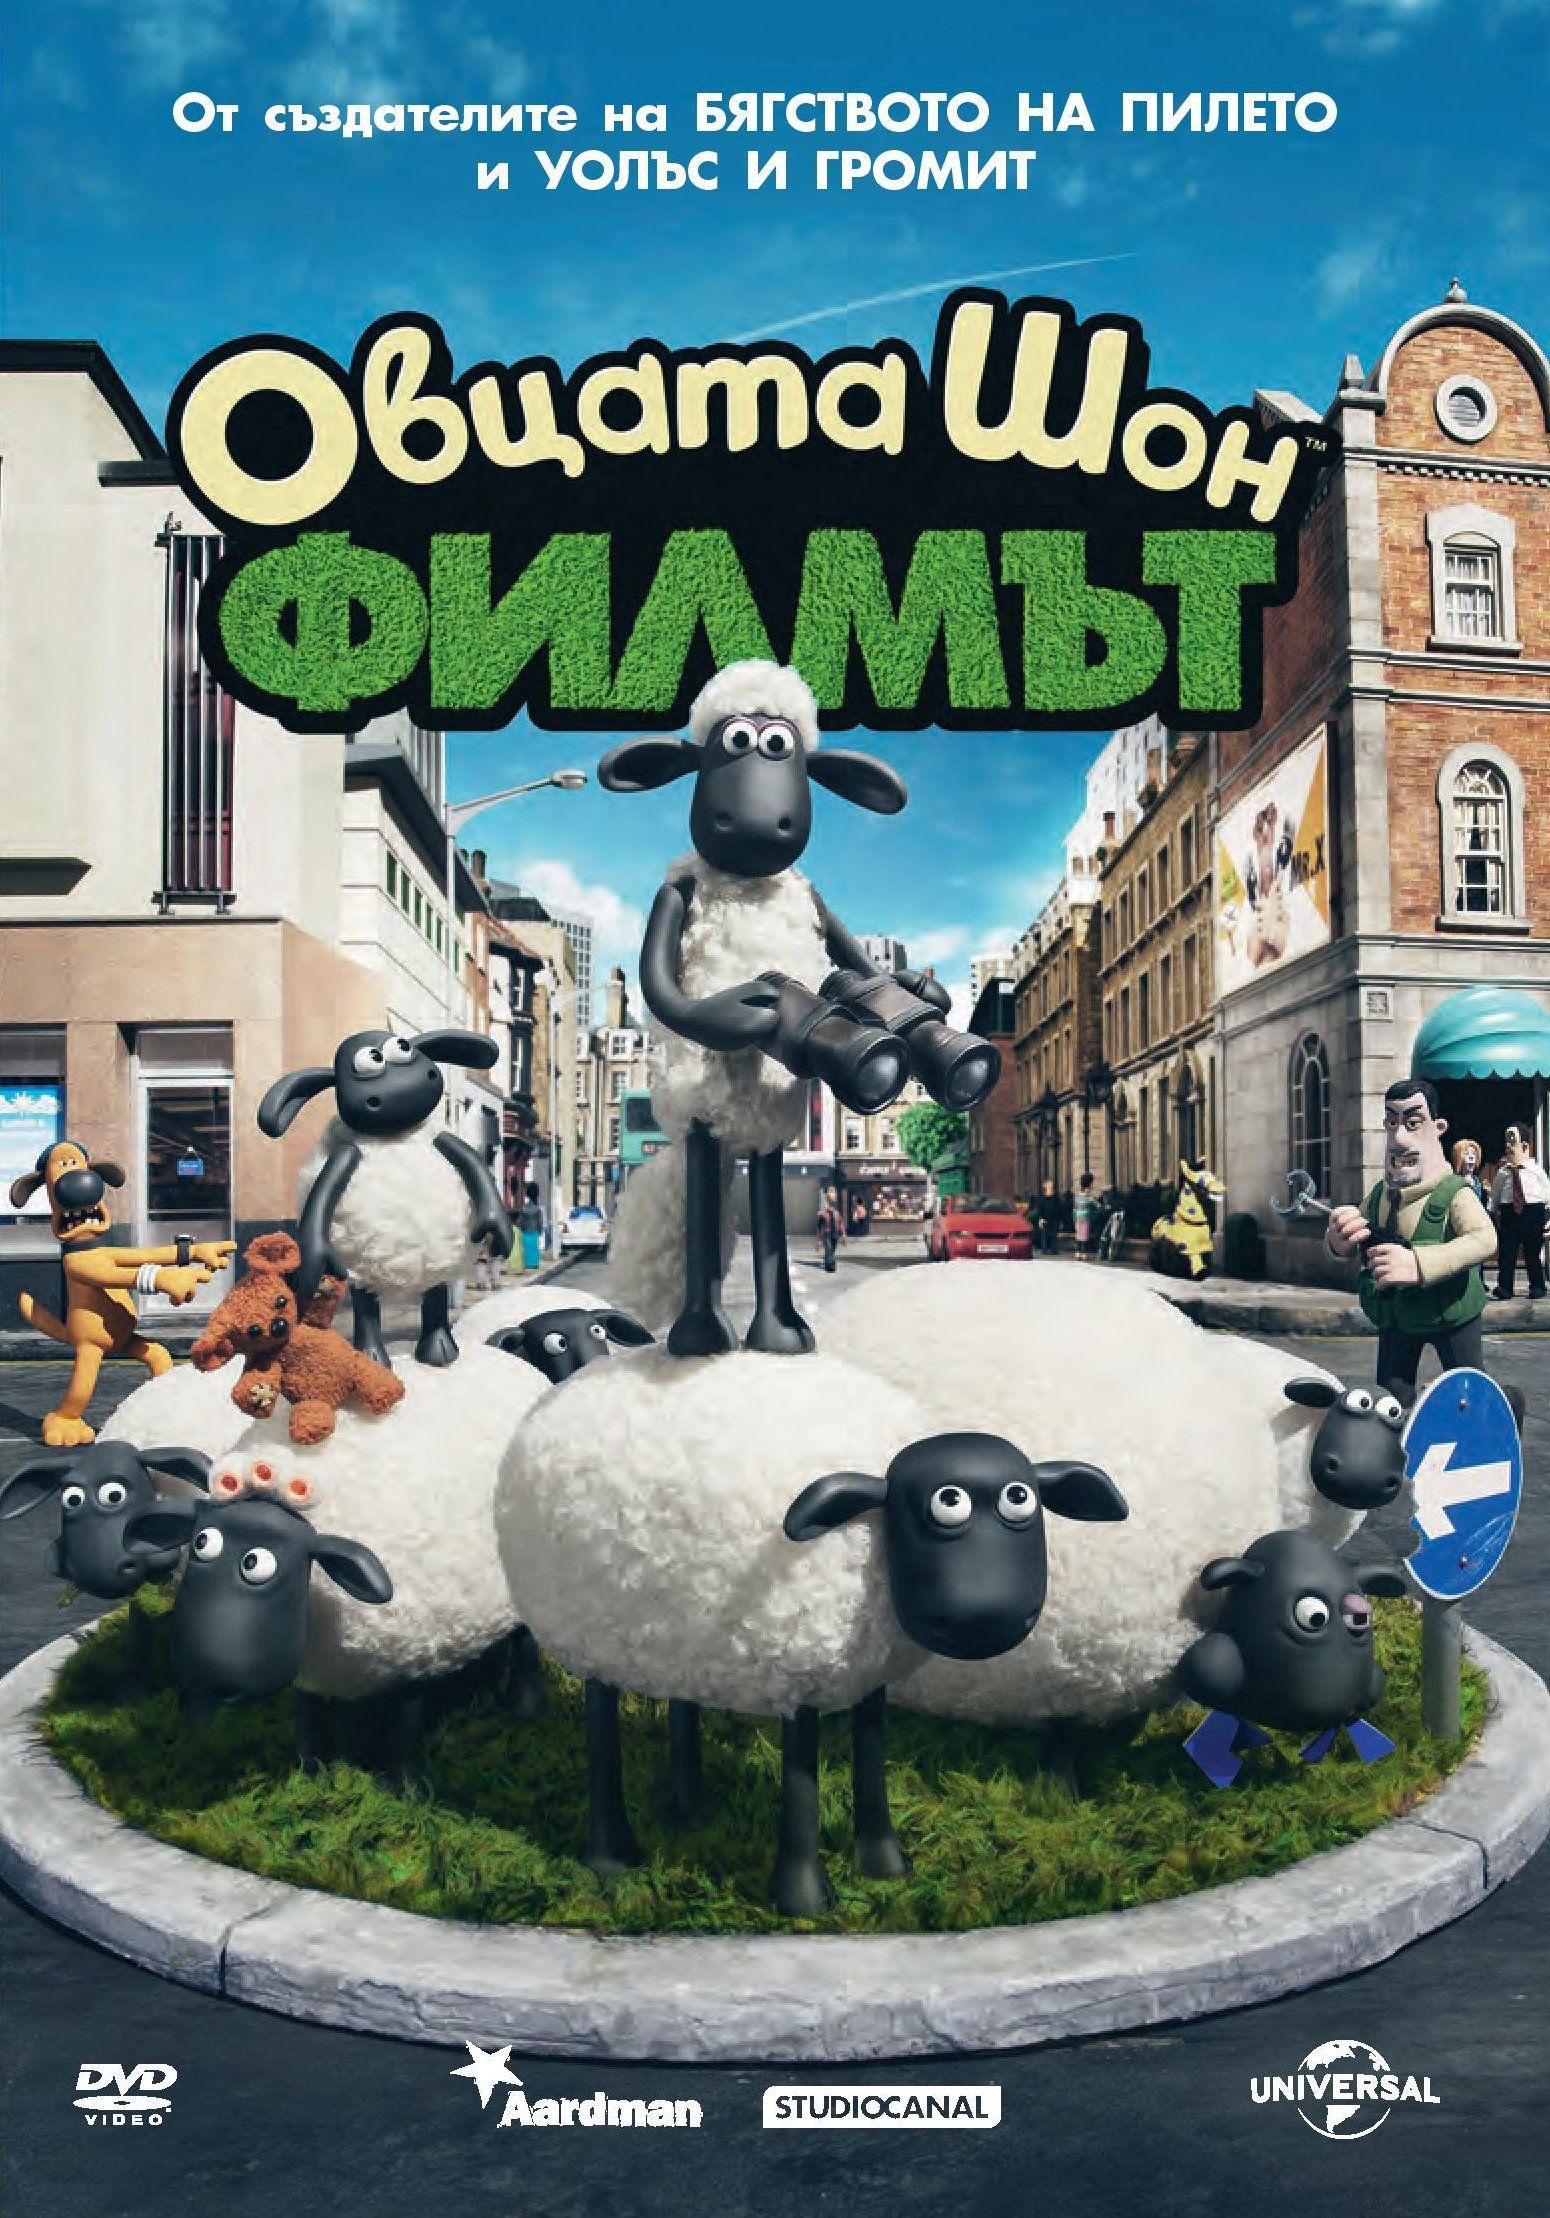 Овцата Шон: Филмът (DVD) - 1